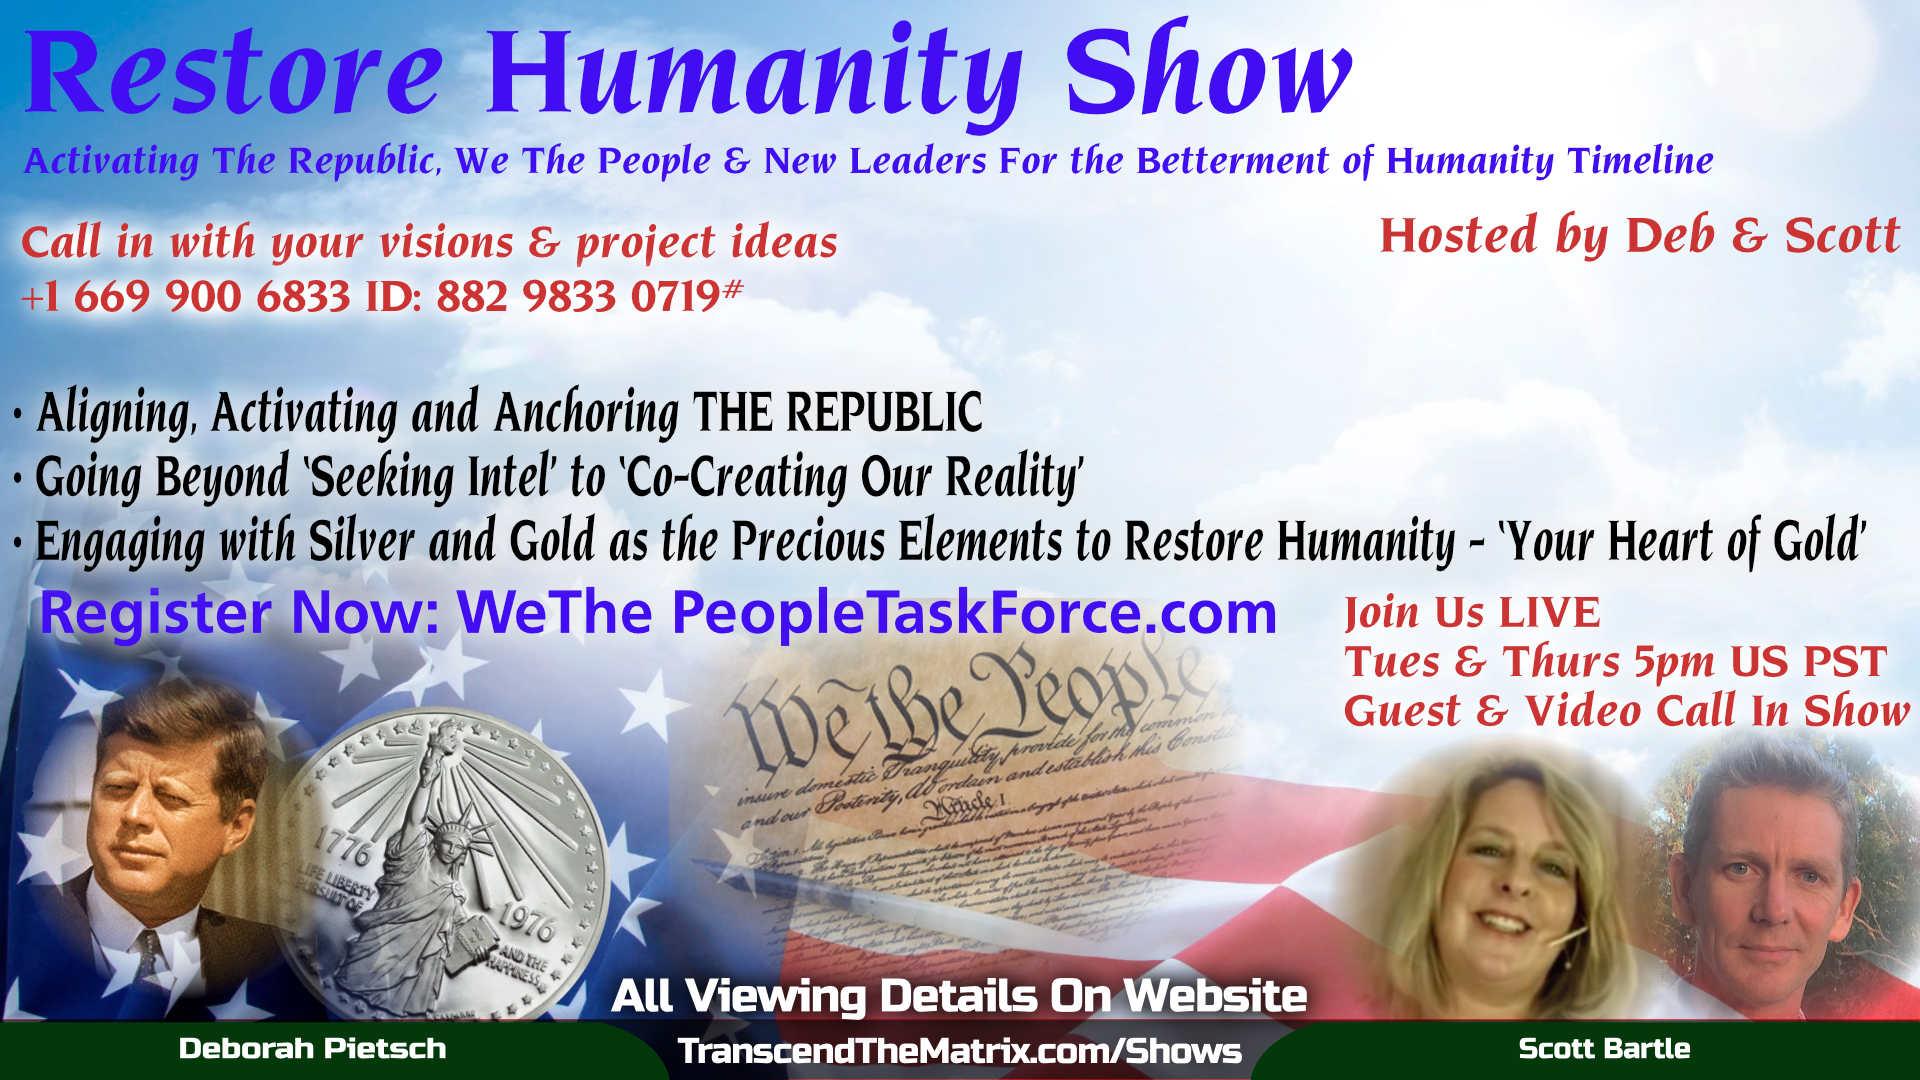 Restore Humanity Show with Deb & Scott